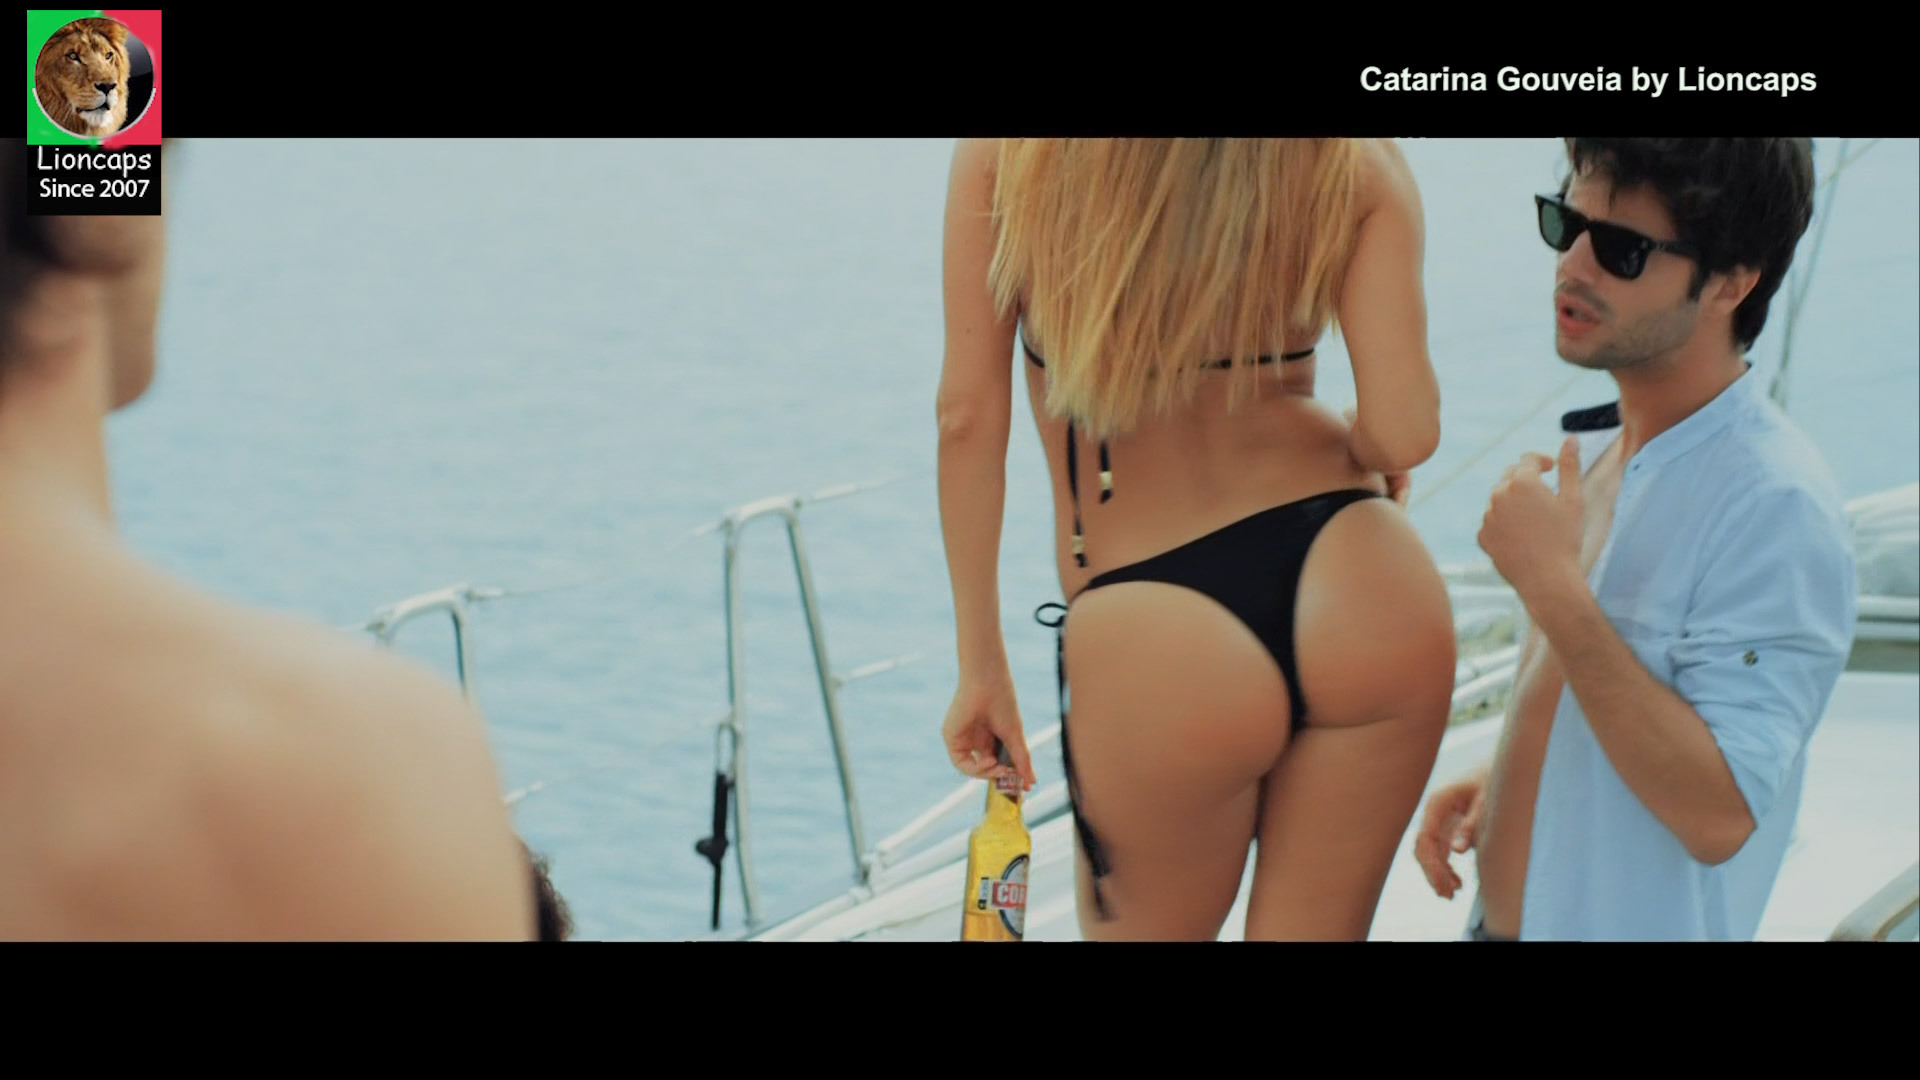 catarina_gouveia_perdidos_lioncaps_09_05_2021_07 (7).jpg